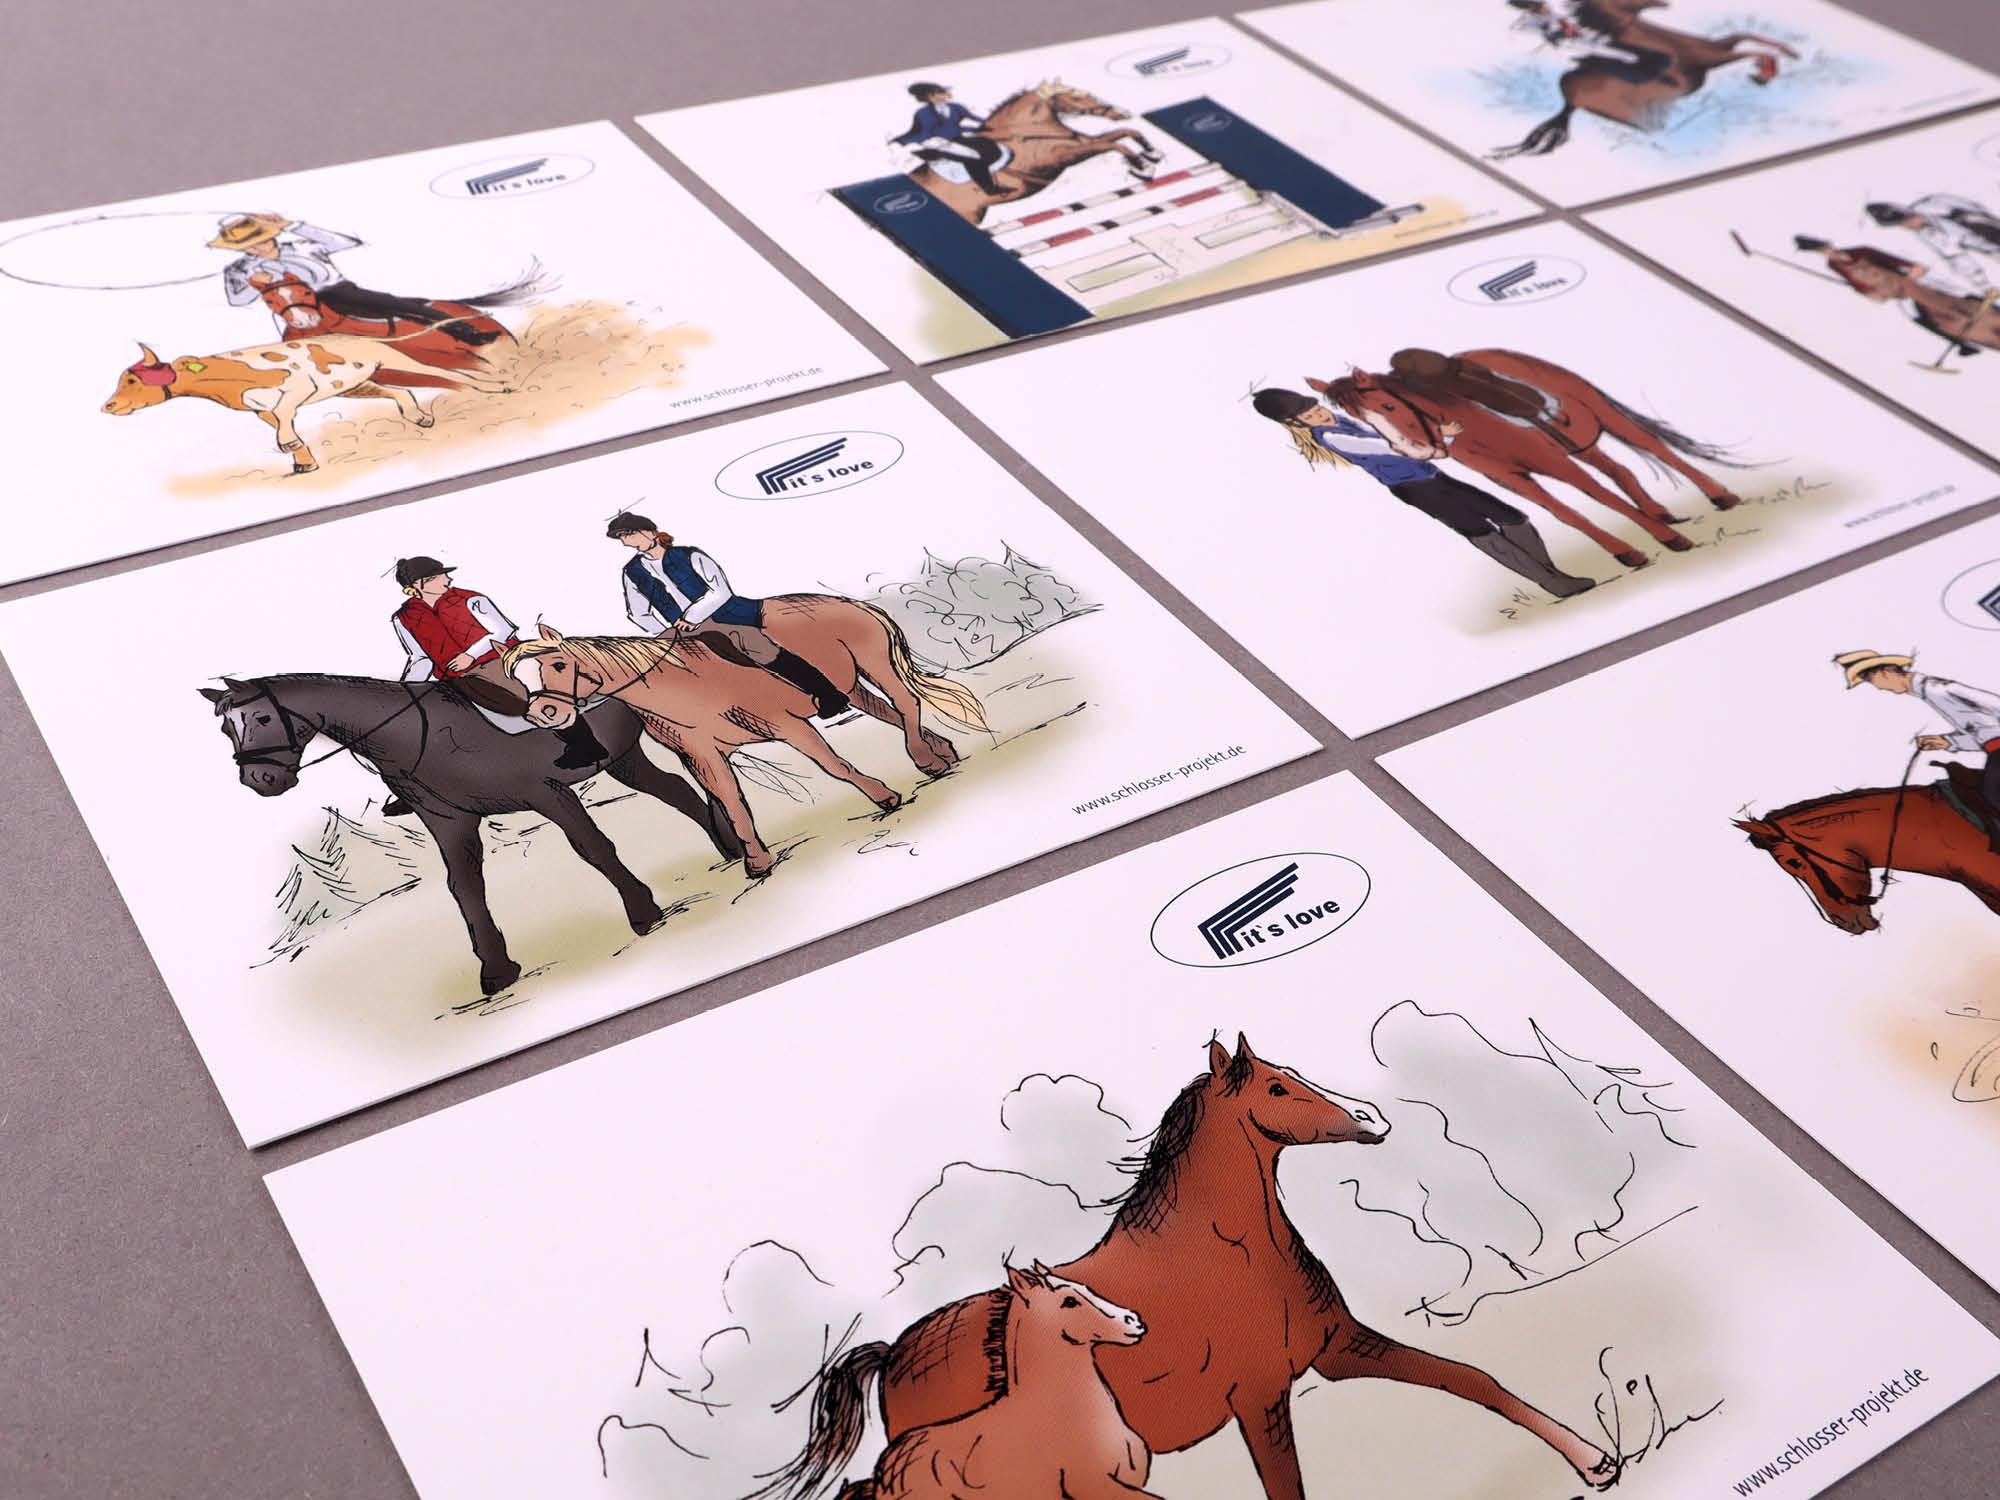 Schlosser - Jagstzell - Americana - Postkarten - 2019 - 02